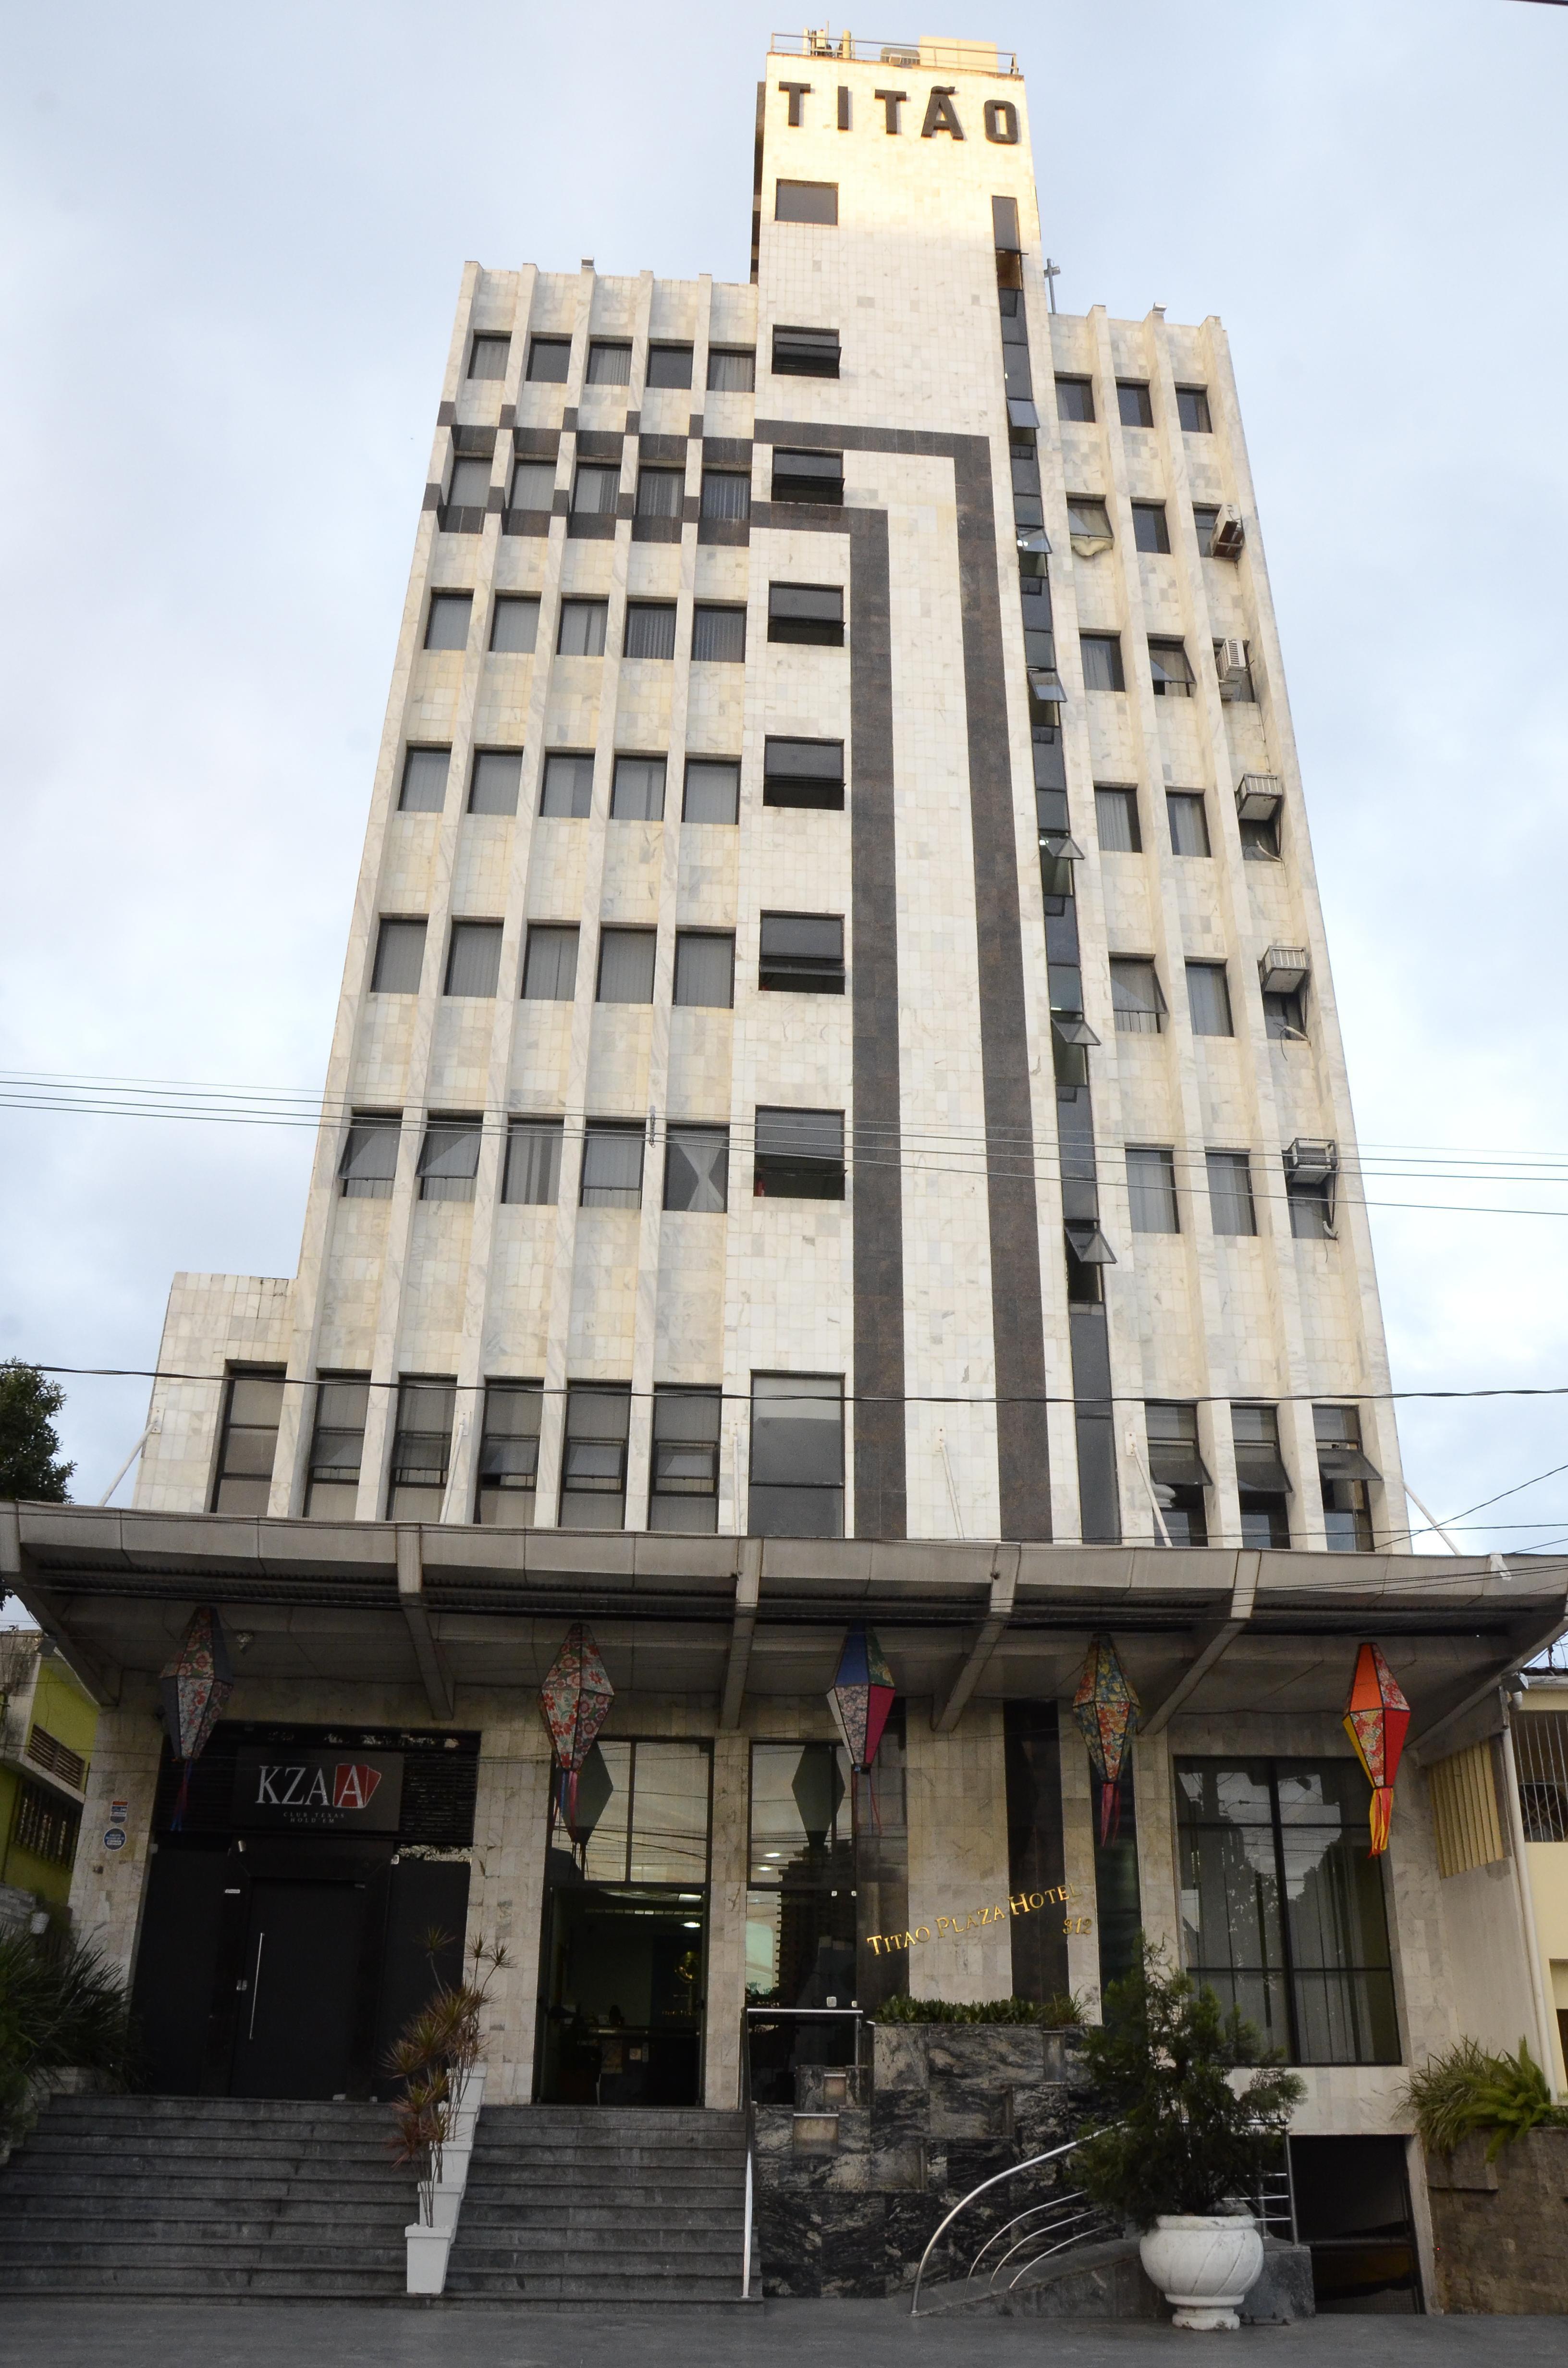 Titao Plaza Hotel